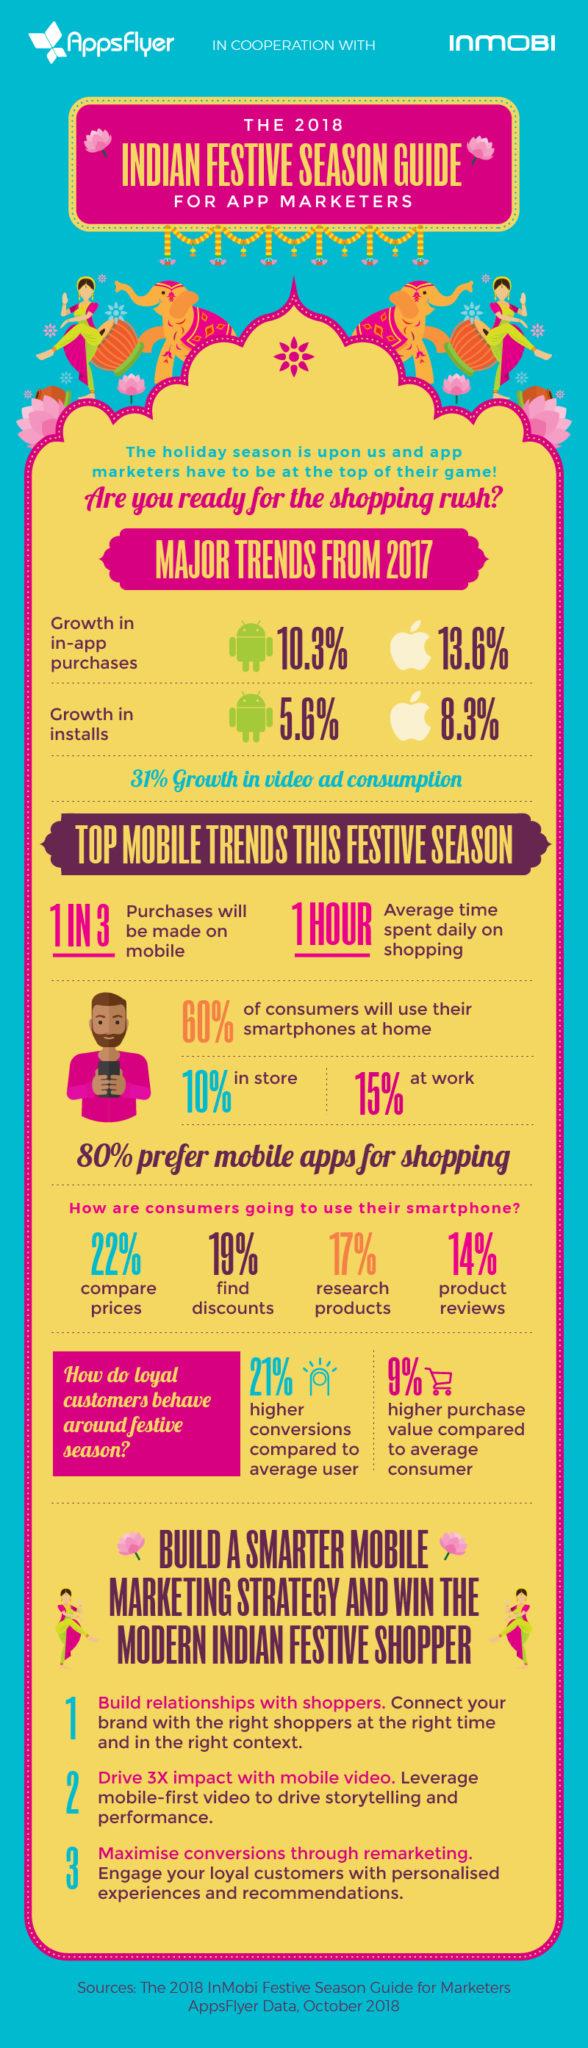 India festive season